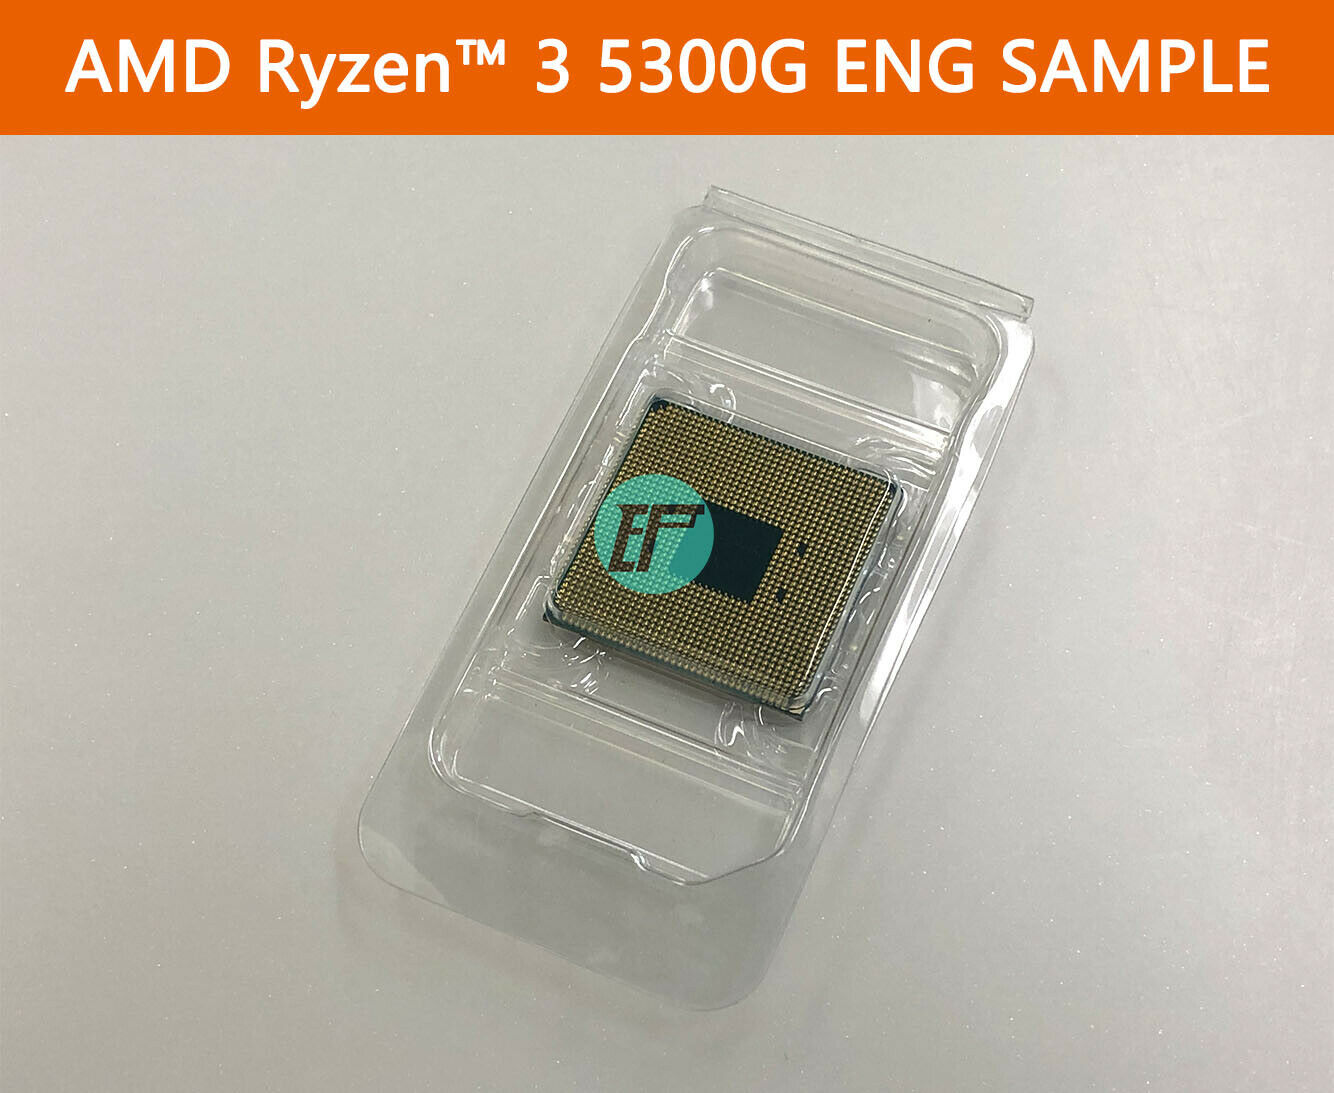 amd-ryzen-5-5300g-4-core-zen-3-desktop-apu-_-benchmarks-_10